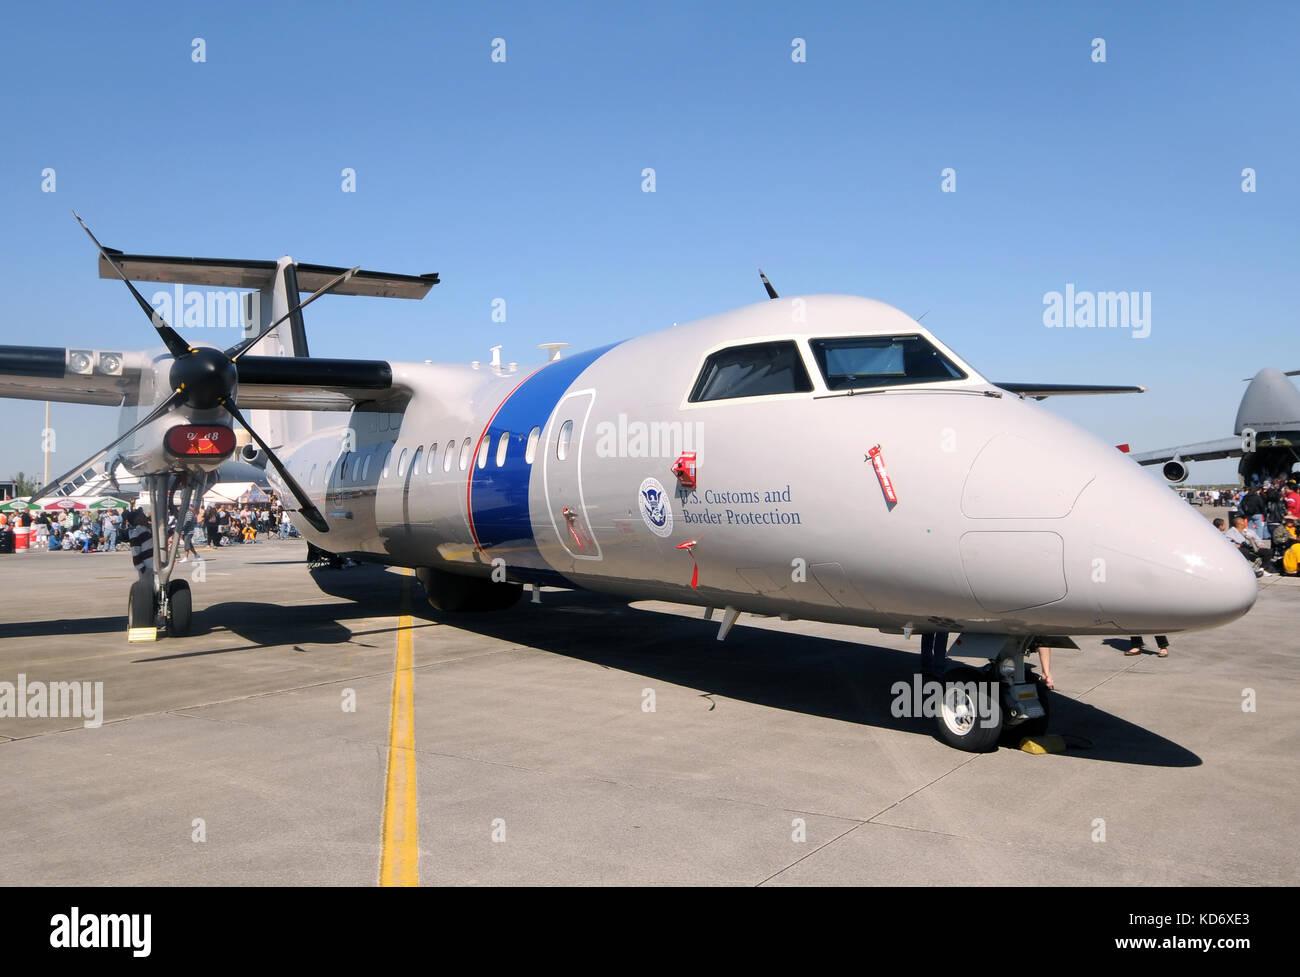 Homestead, Florida - November 6, 2010: US ustoms and Border protection Dash-8 airplane visiting the Homestead Air - Stock Image